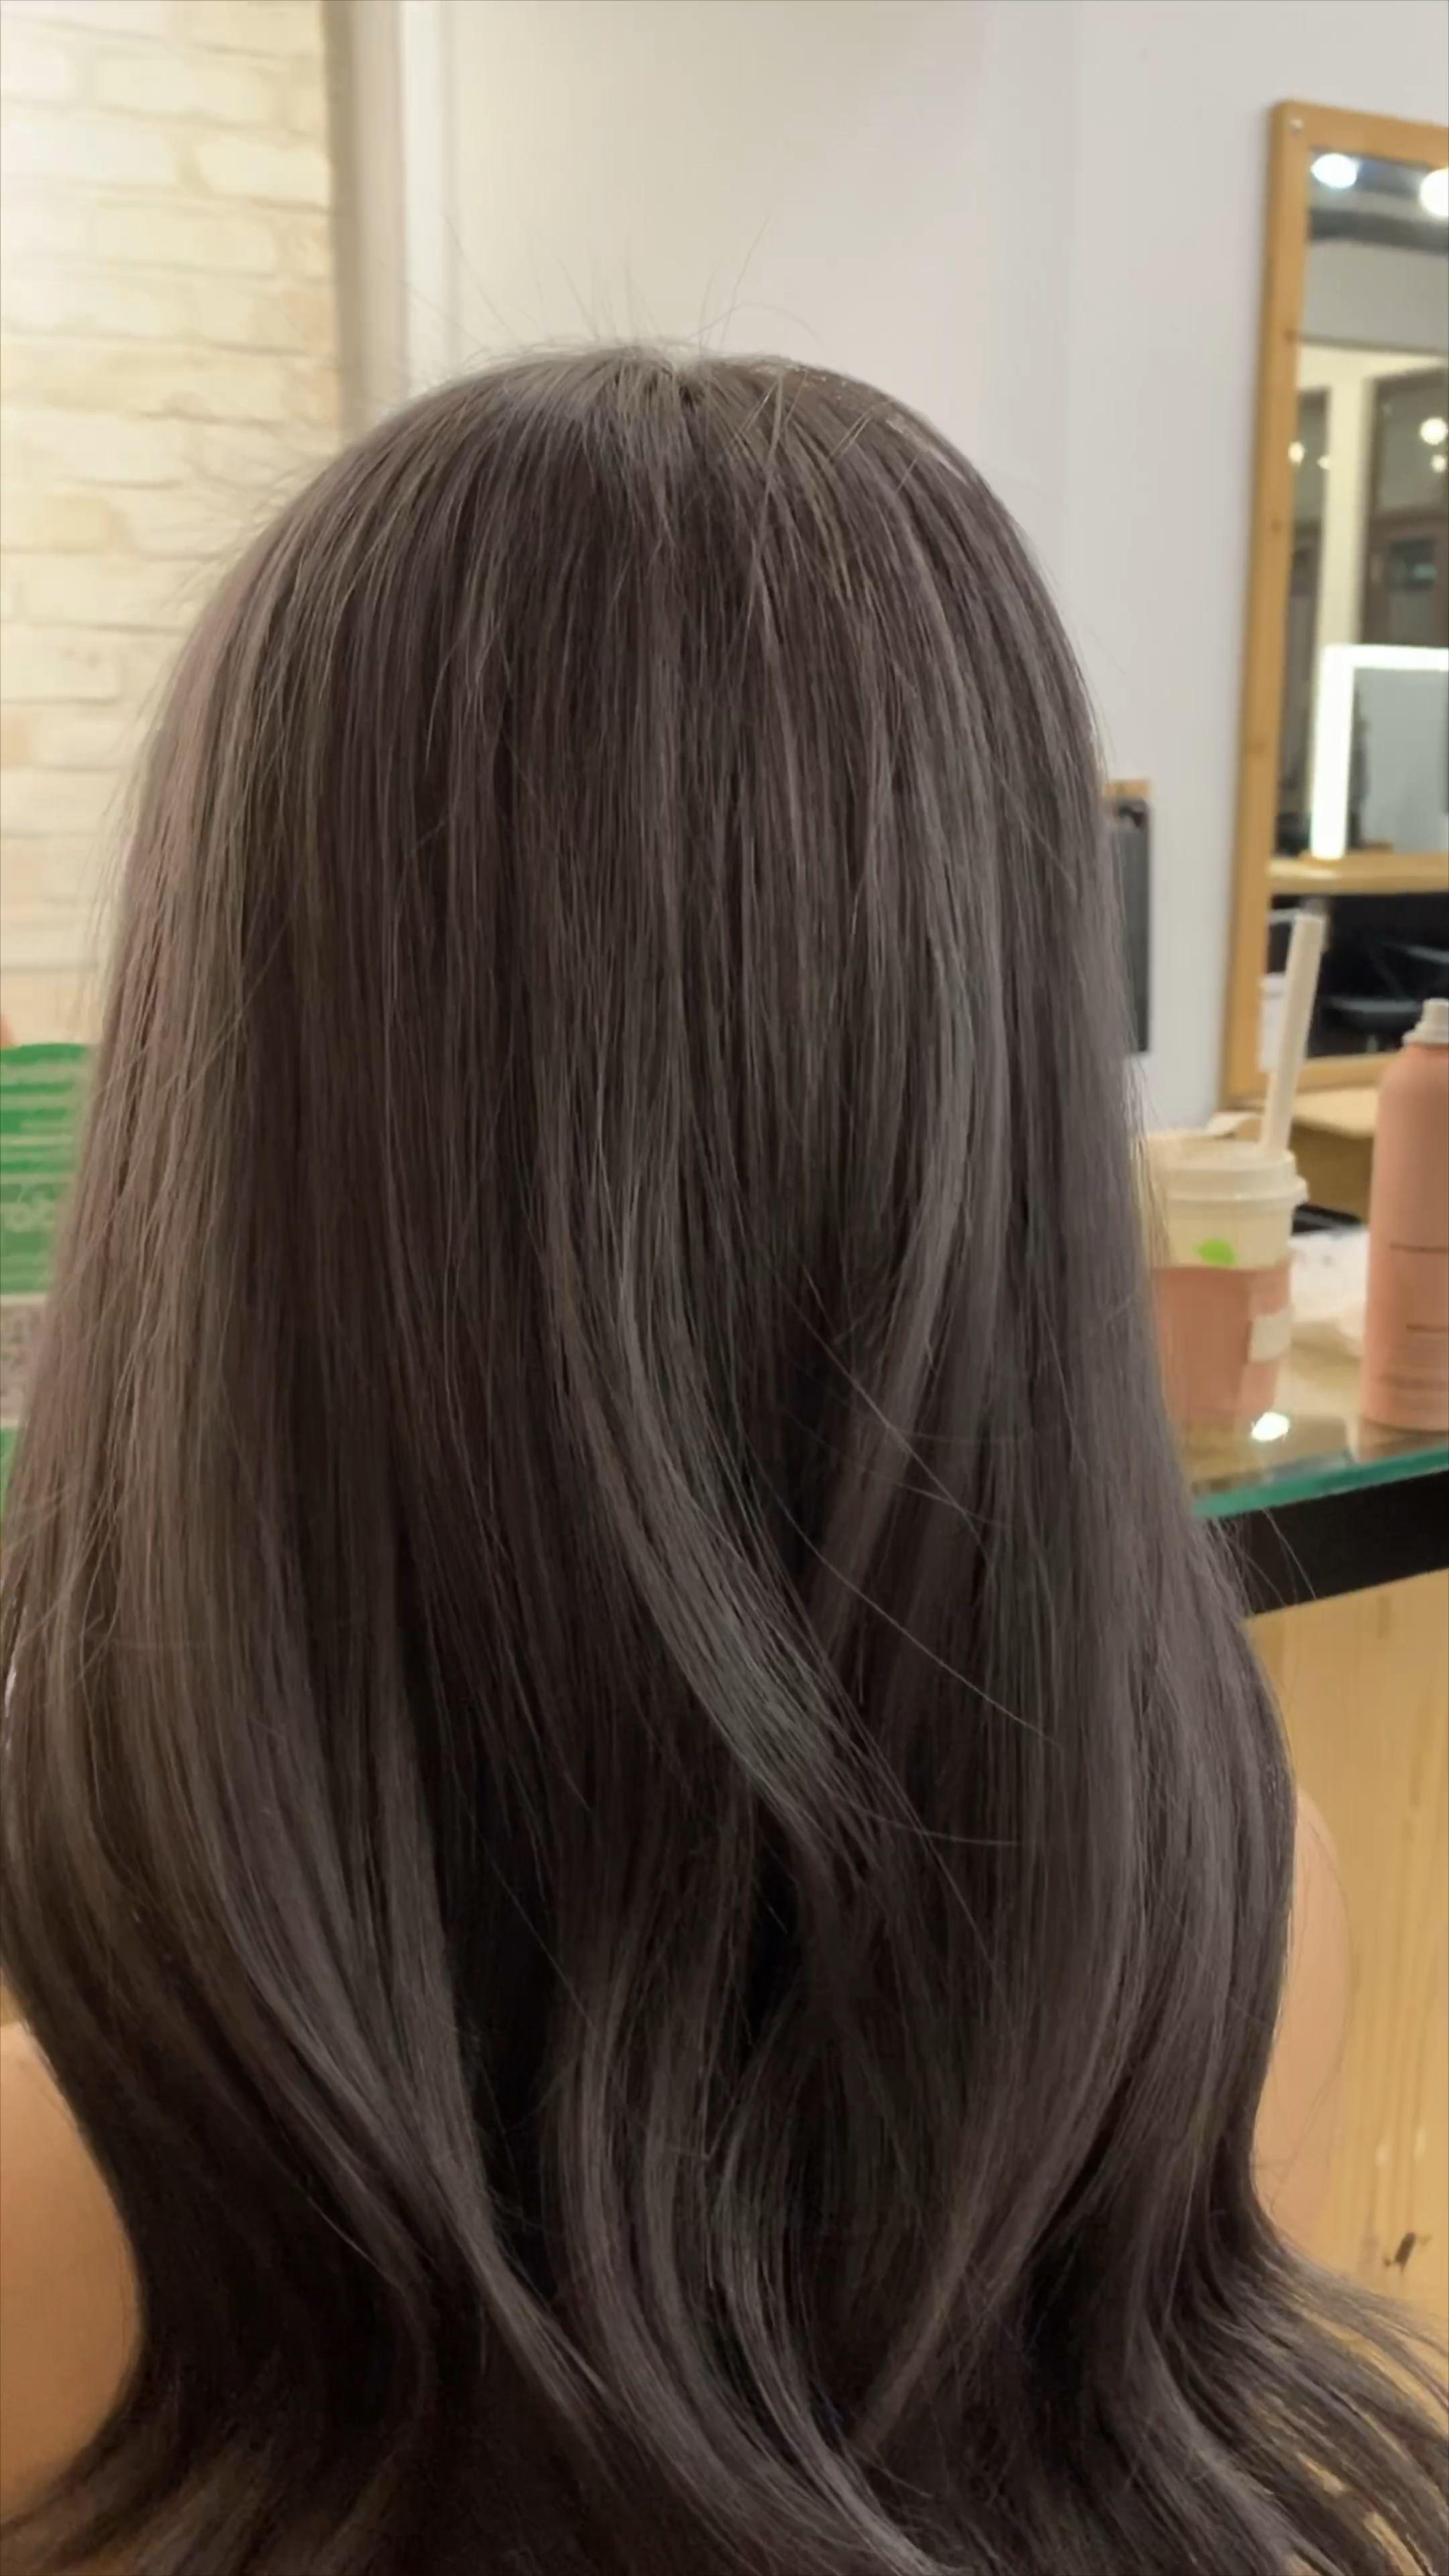 Short Hairstyle Panosundaki Pin